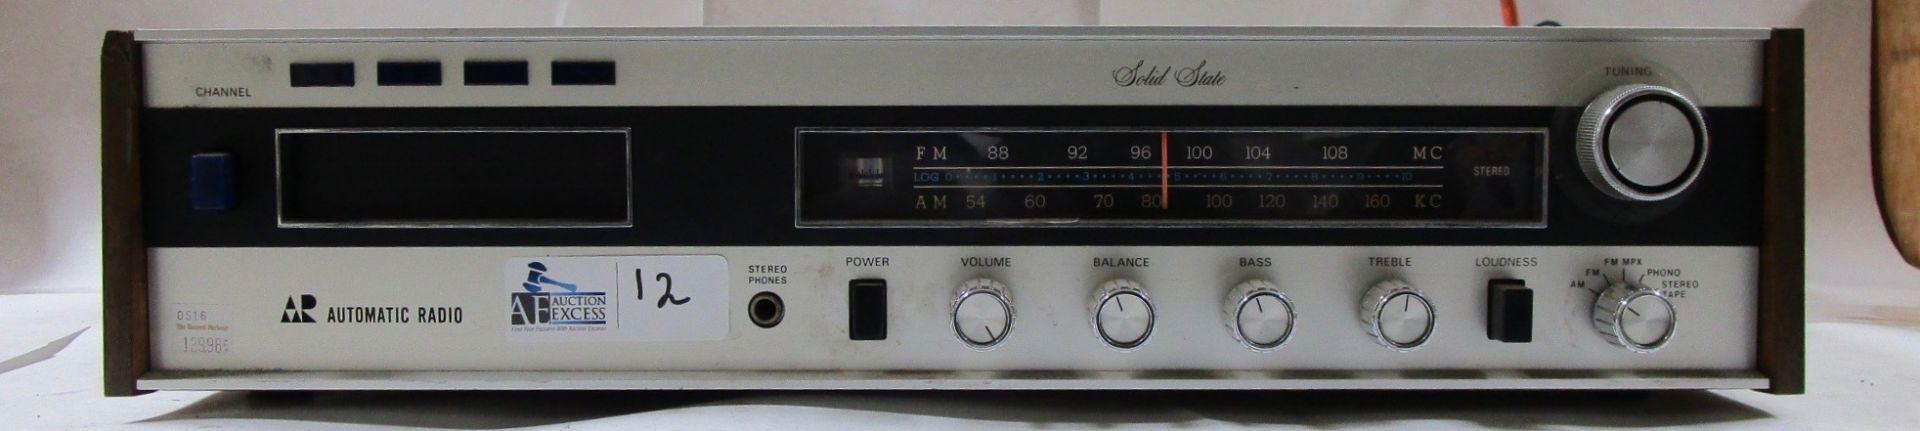 Lot 12 - AUTOMATIC RADIO HMX-4000